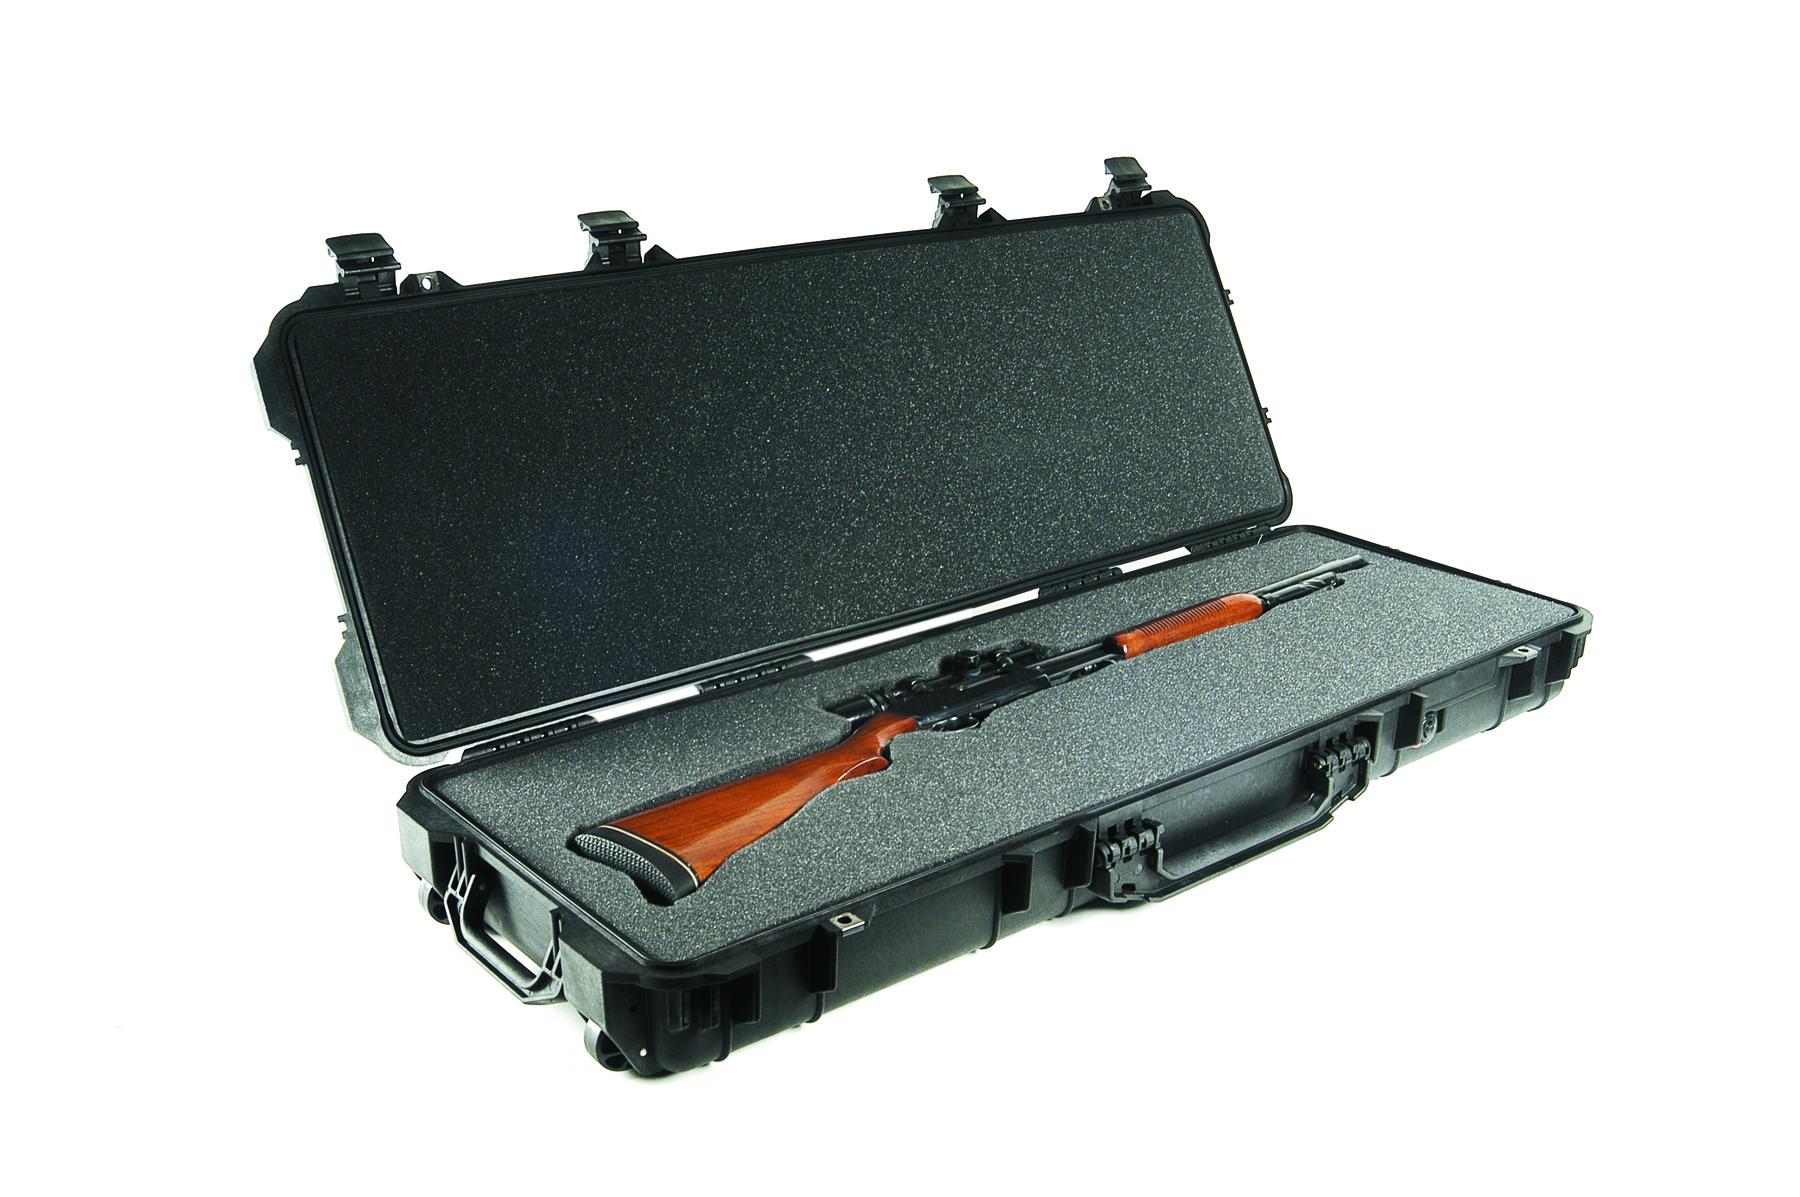 1720 - Pelican 1720 Pelican Rifle Case Custom Cut Foam